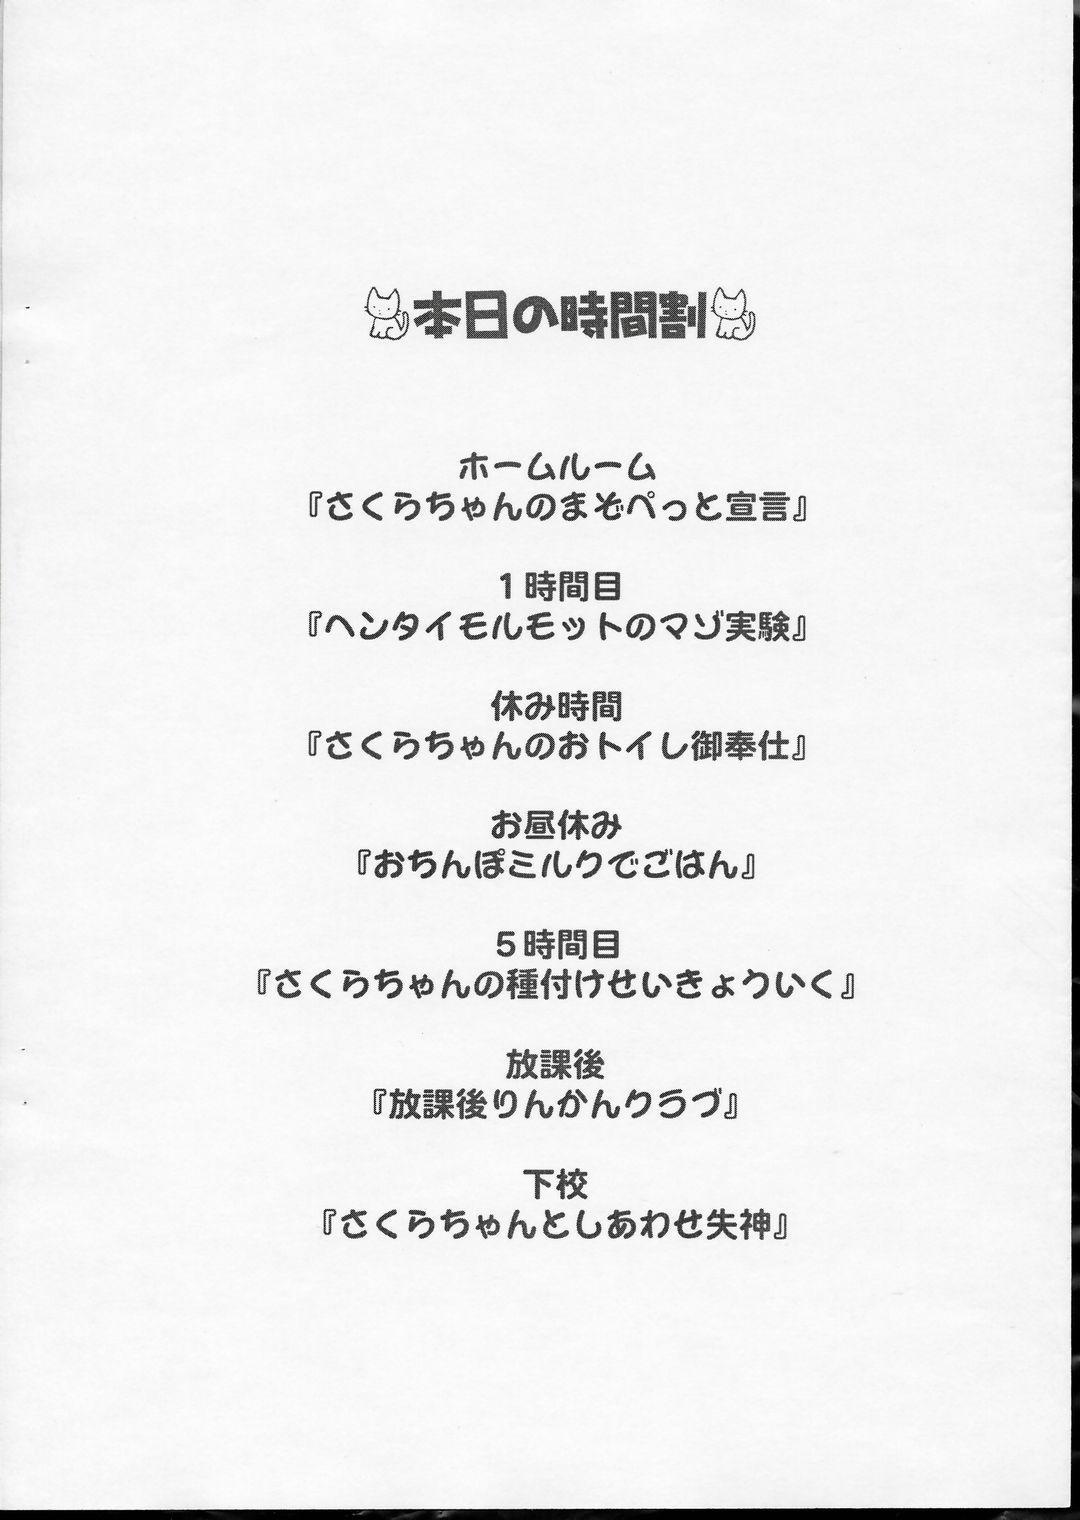 Masochist Pet Sakura Copy-shi 1